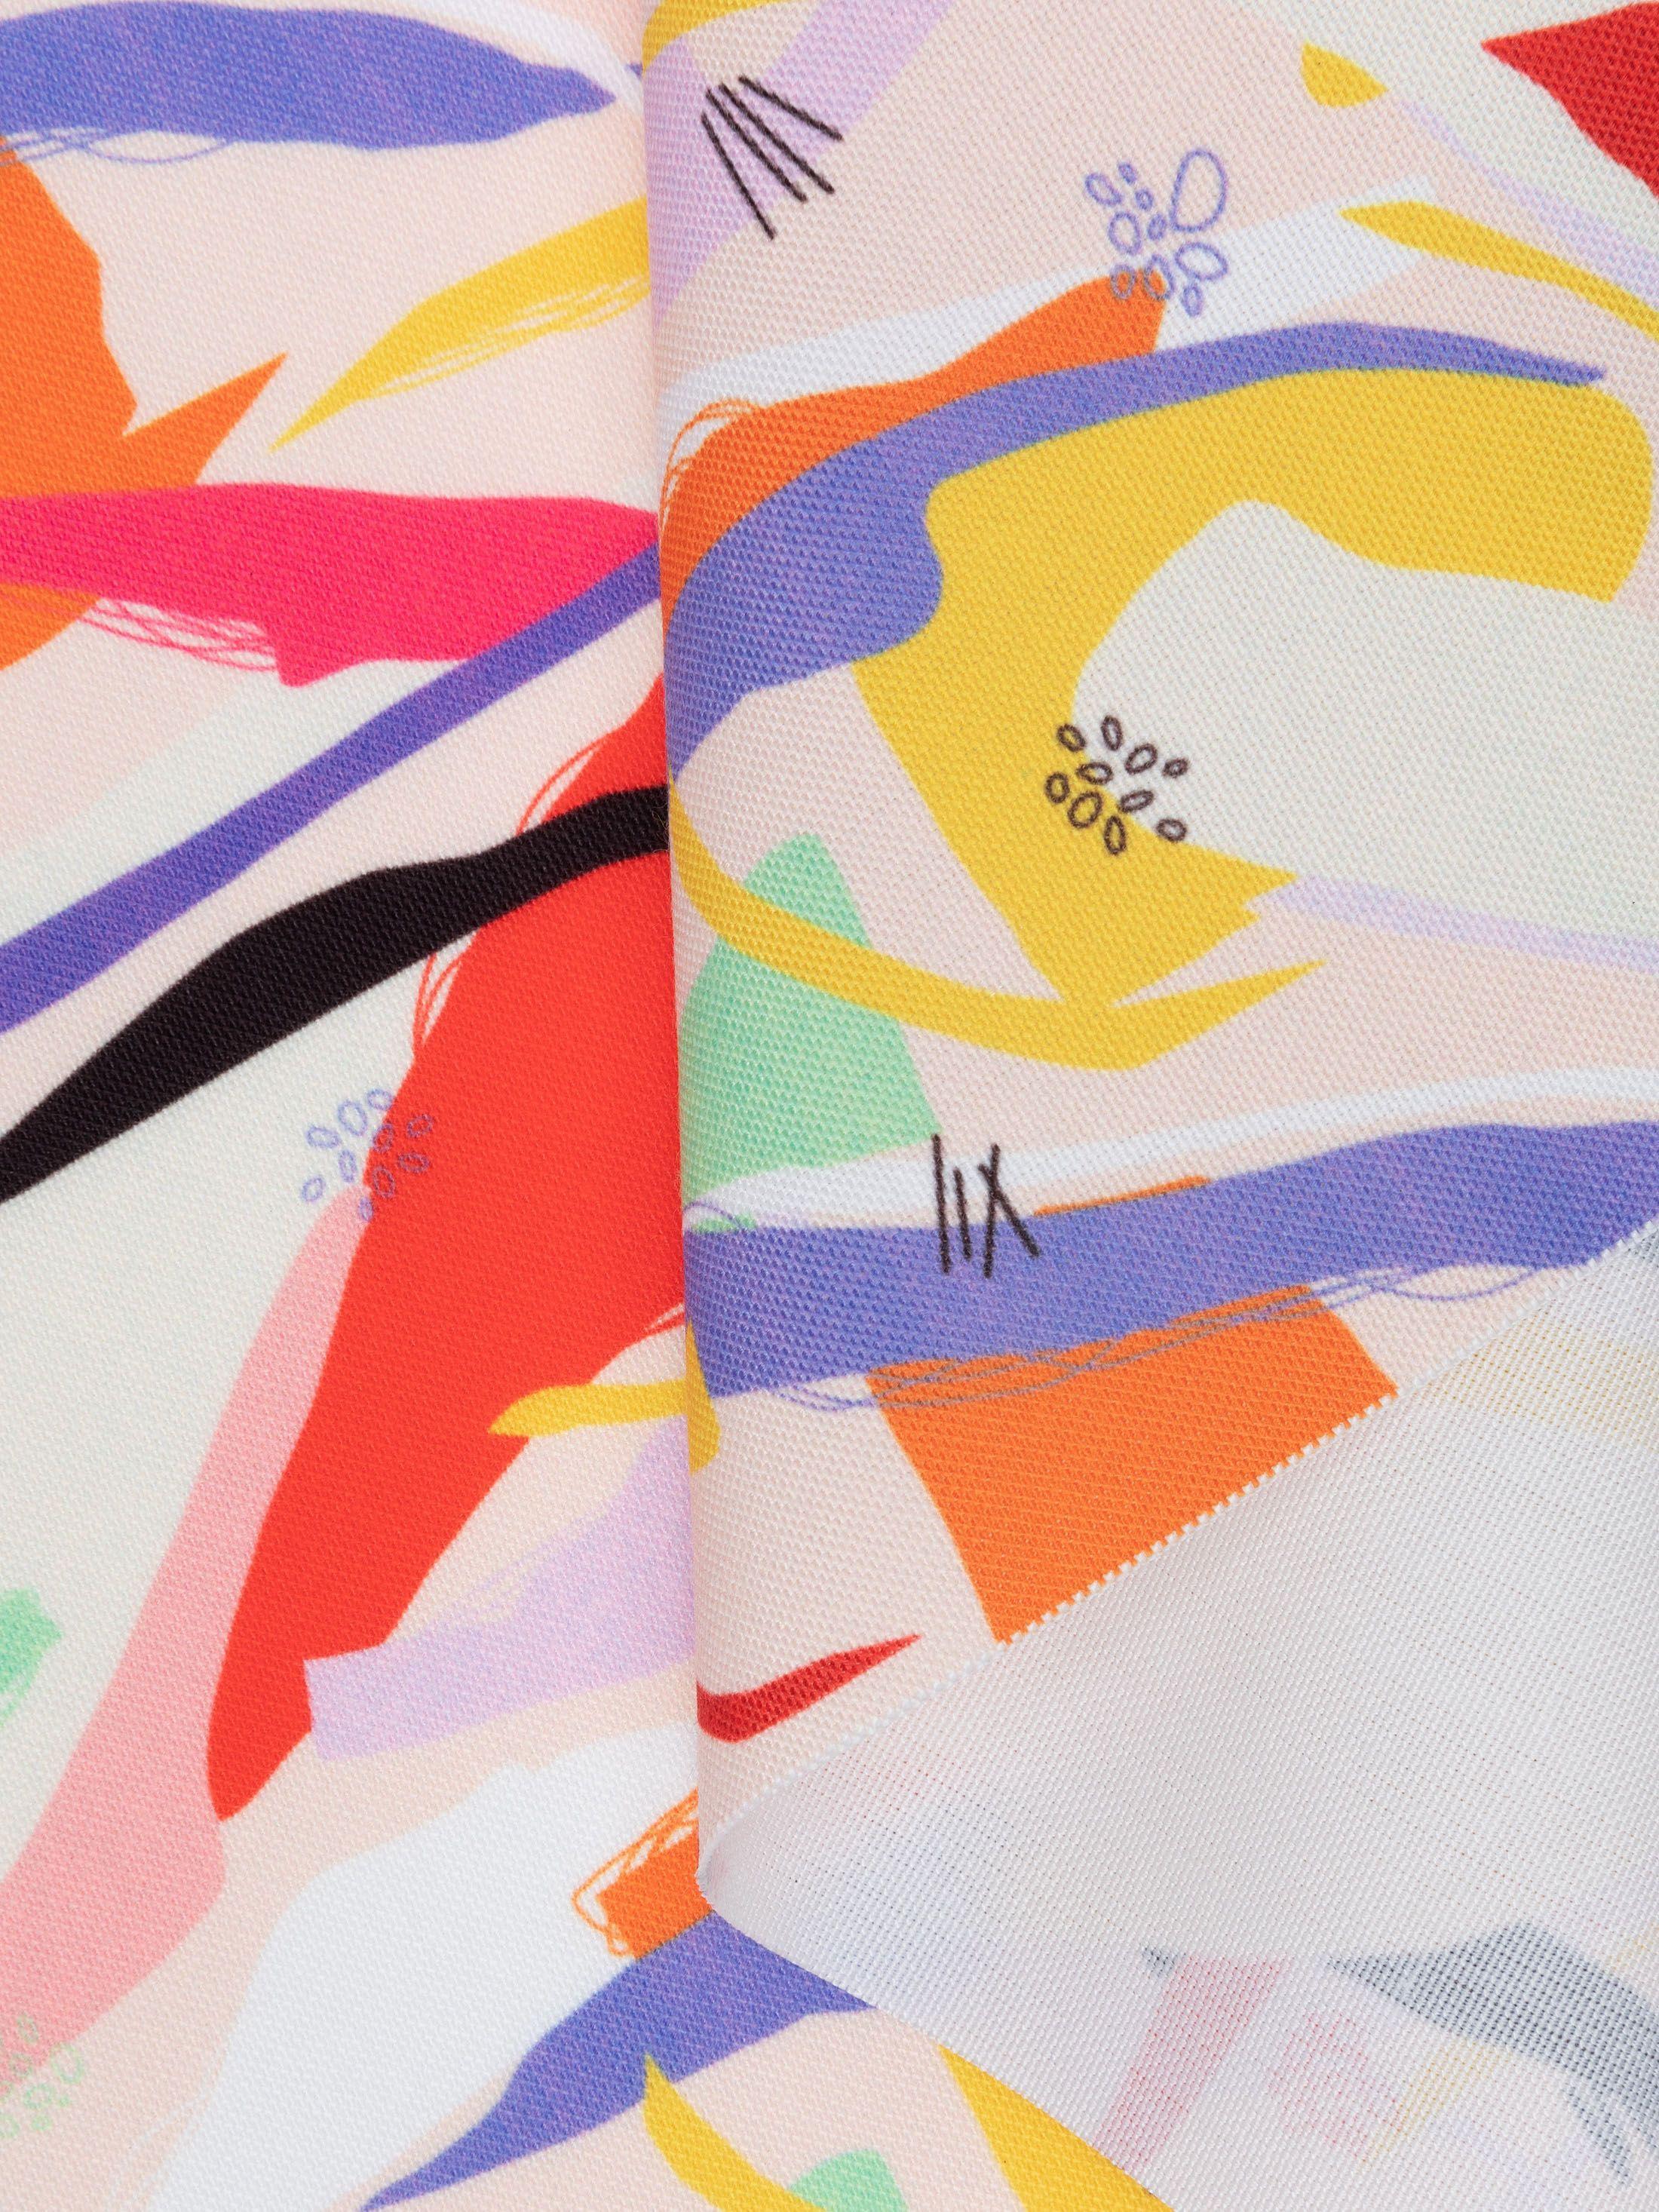 Custom printing on digital printing on canvas fabric